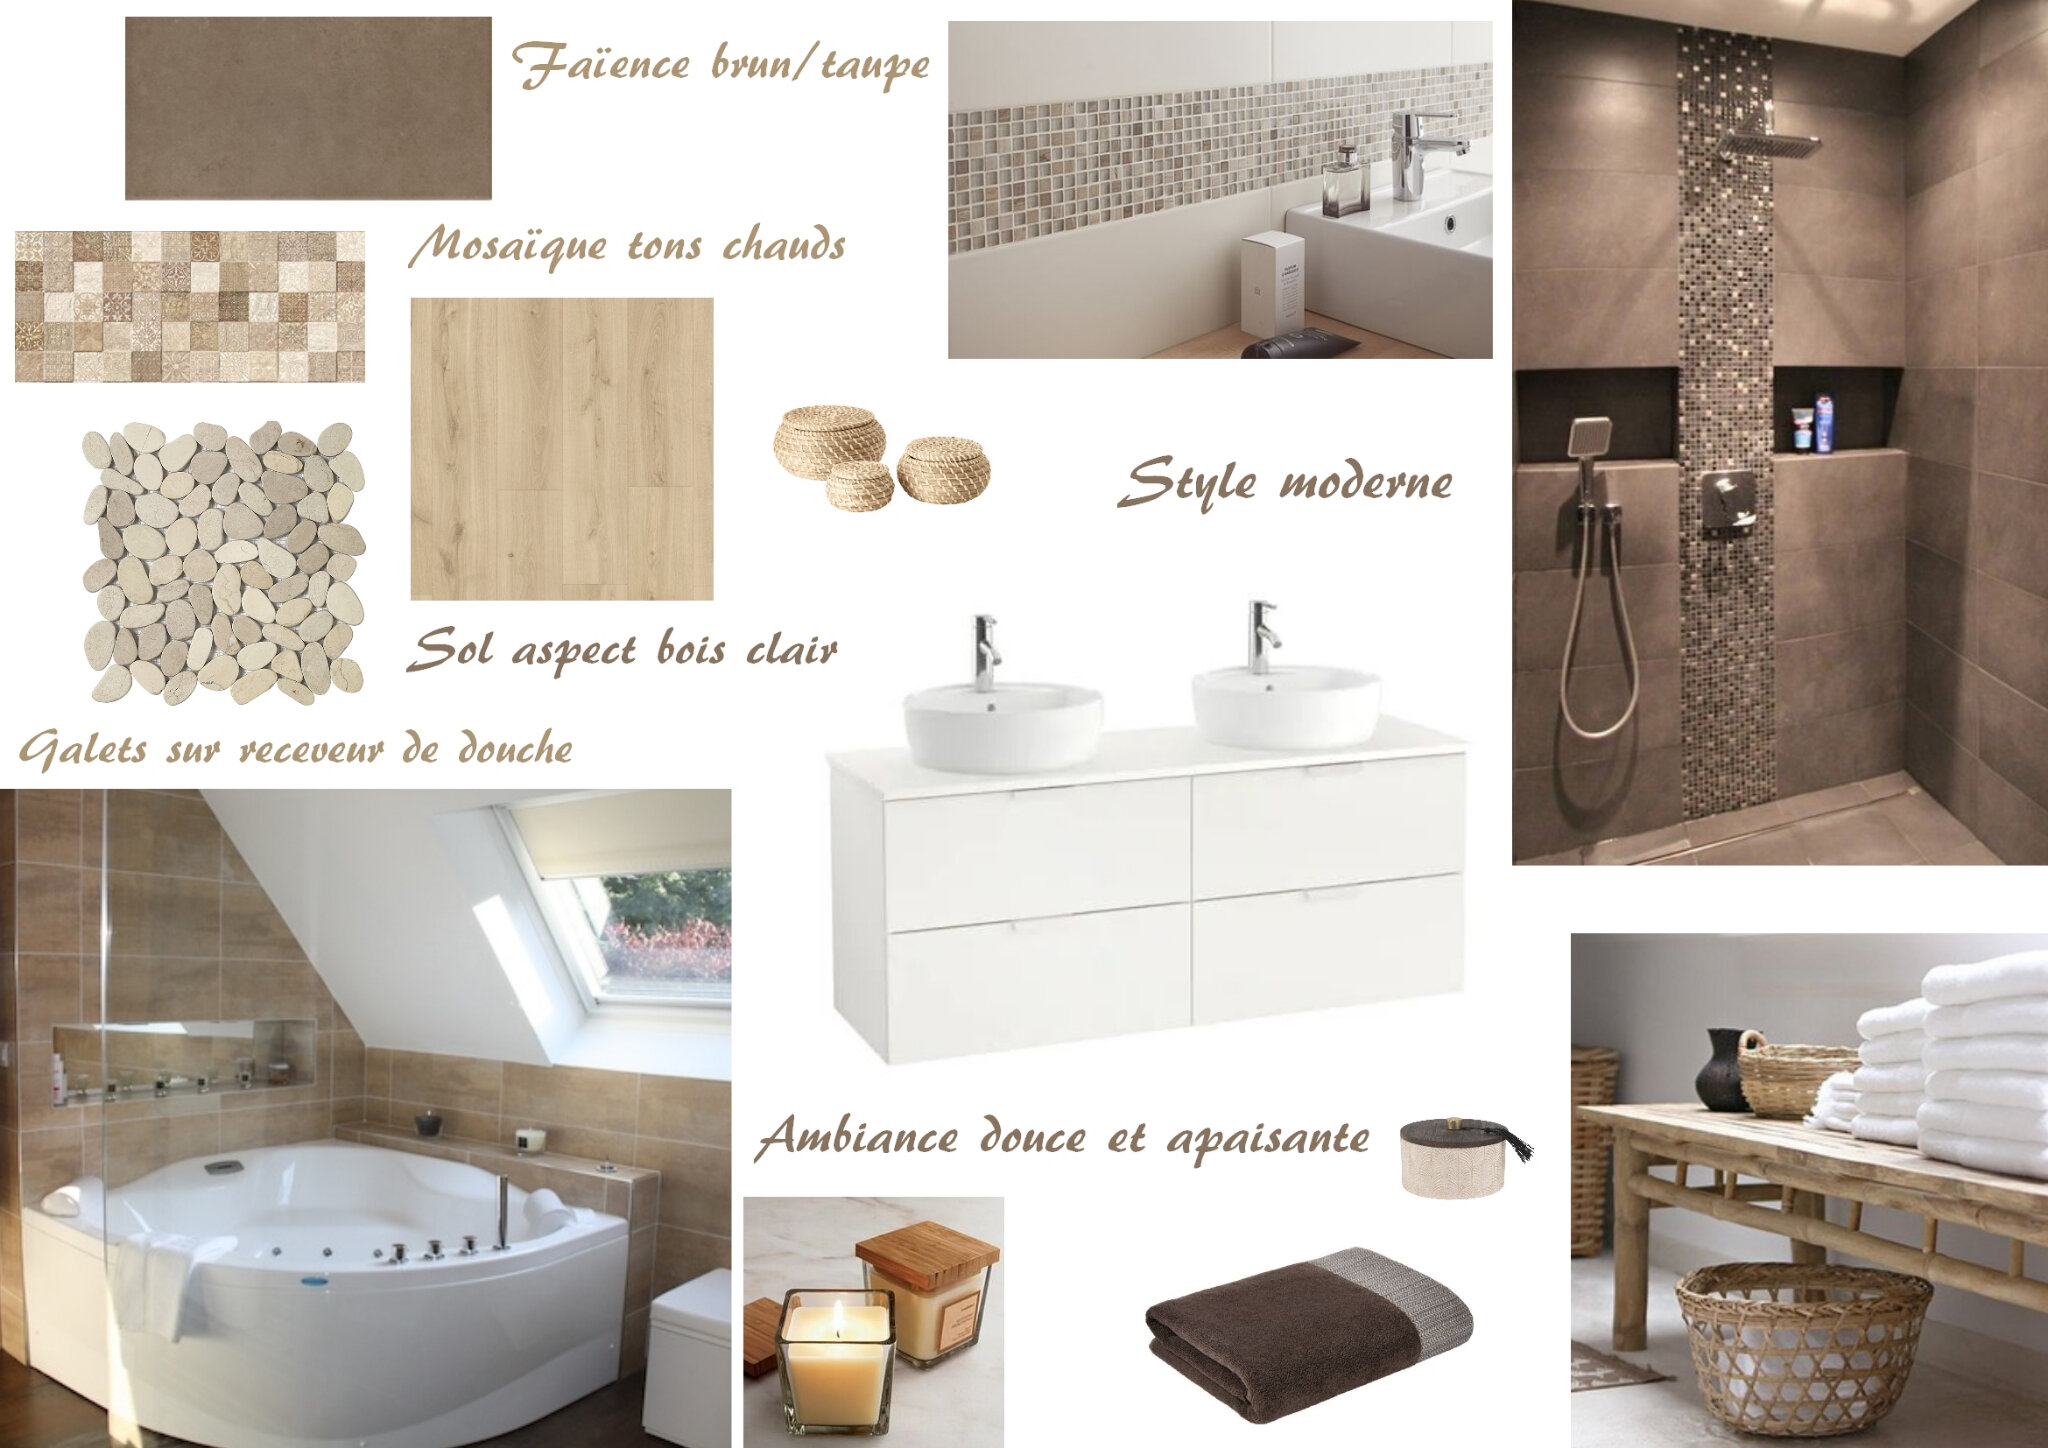 Une Salle De Bain Moderne Et Chaleureuse Sonia Saelens Deco